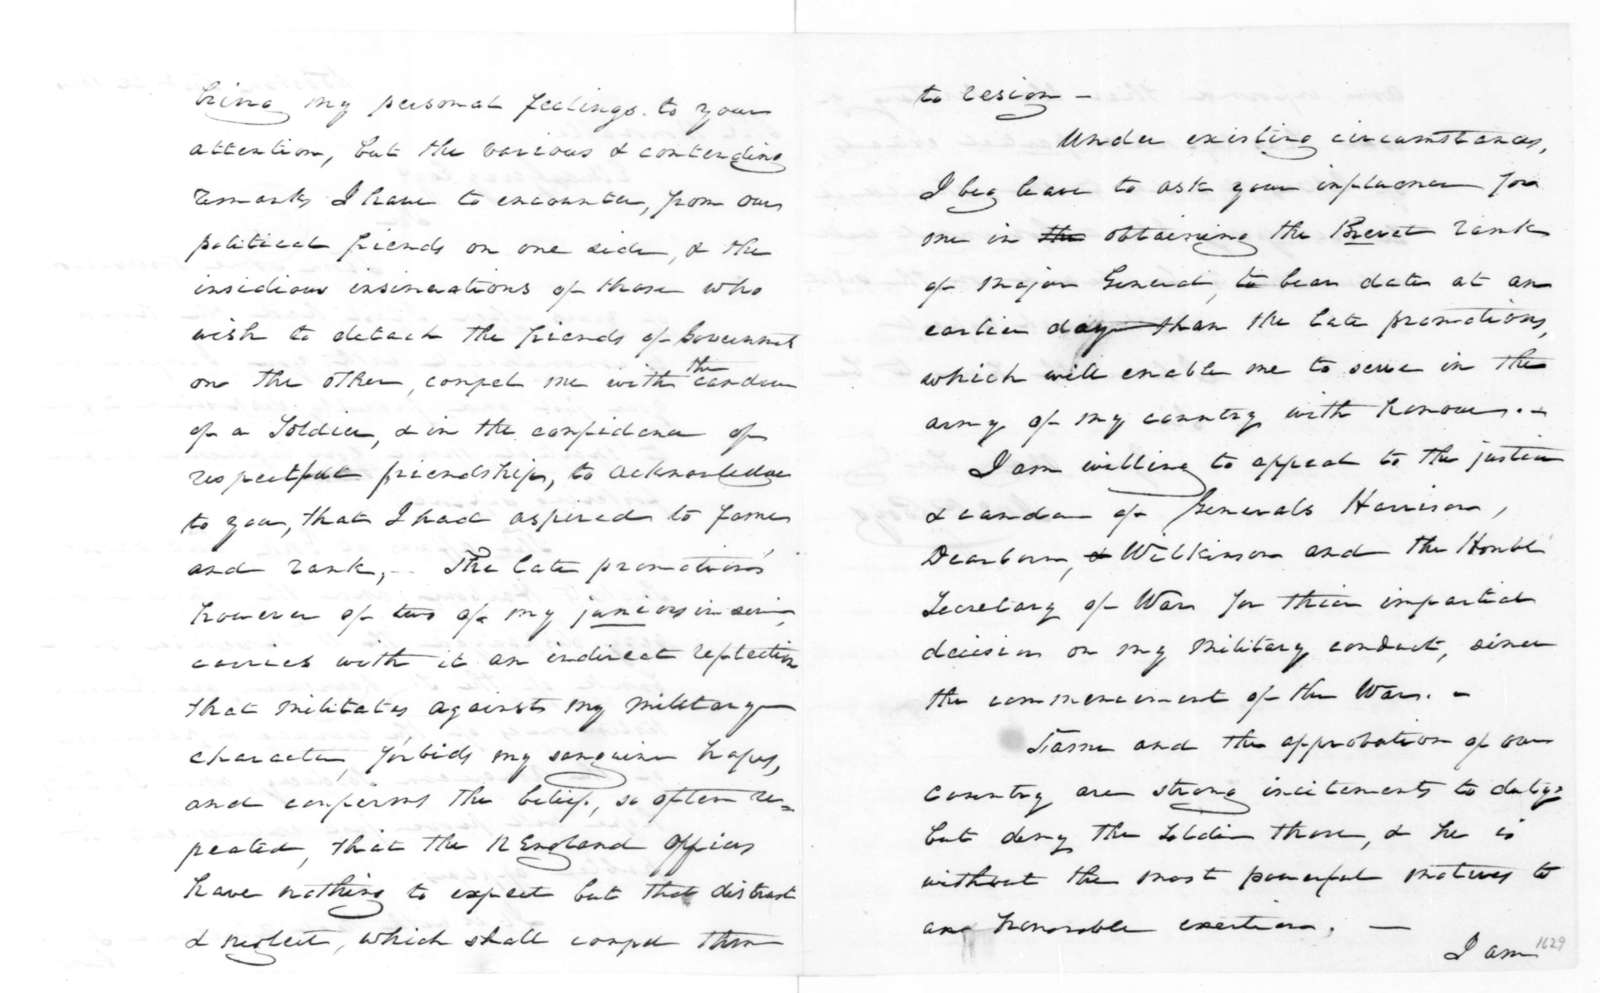 Jonathan P. Boyd to Elbridge Gerry, February 22, 1814.